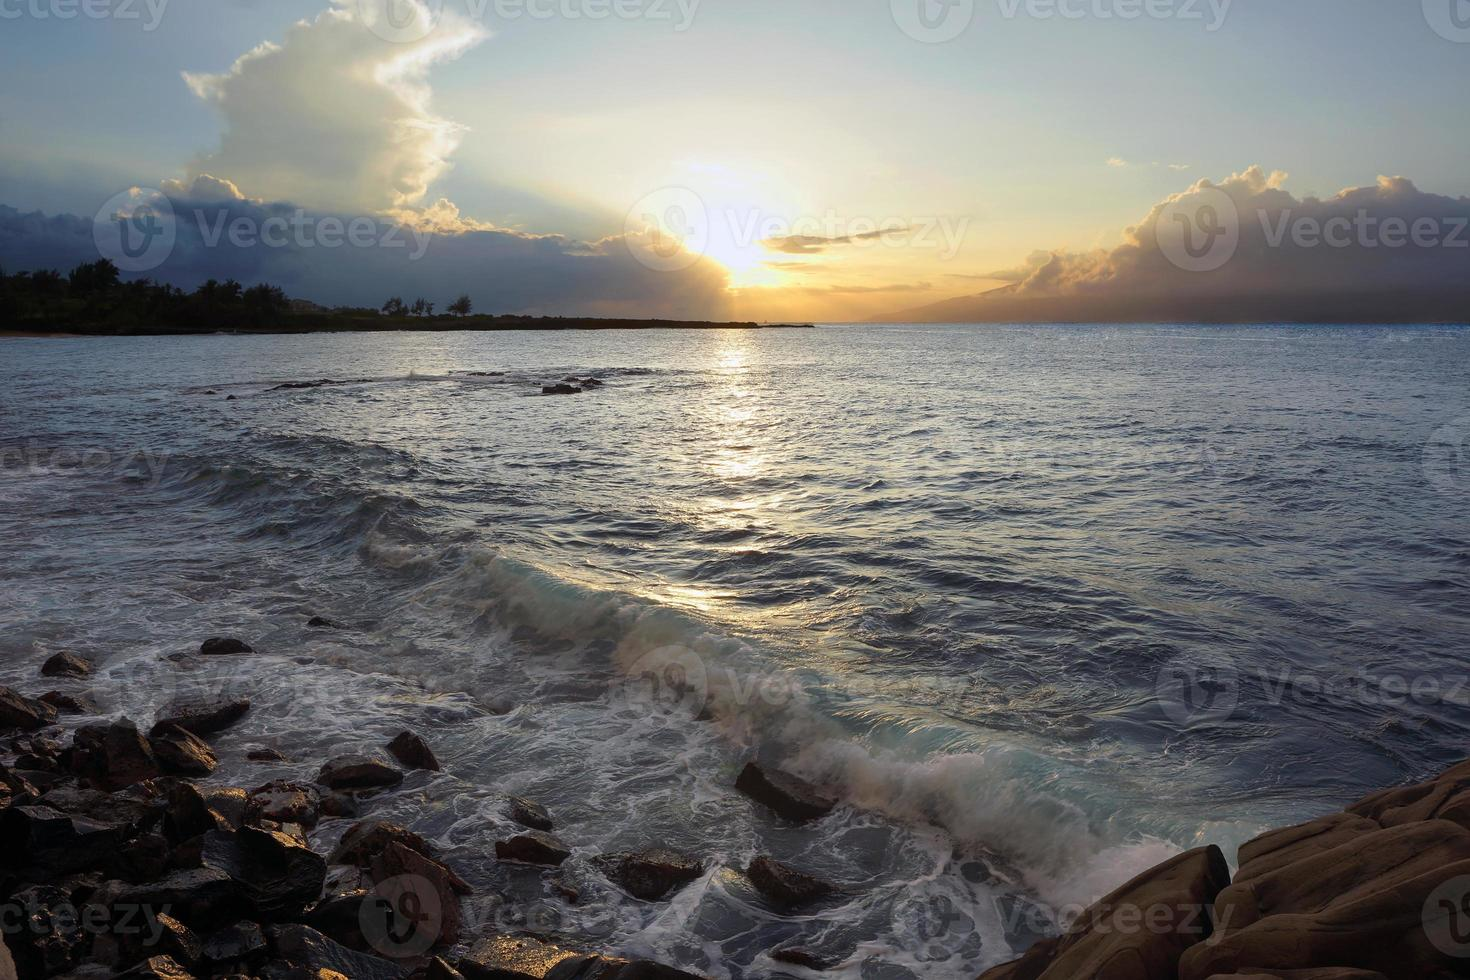 Sunset over Maui photo